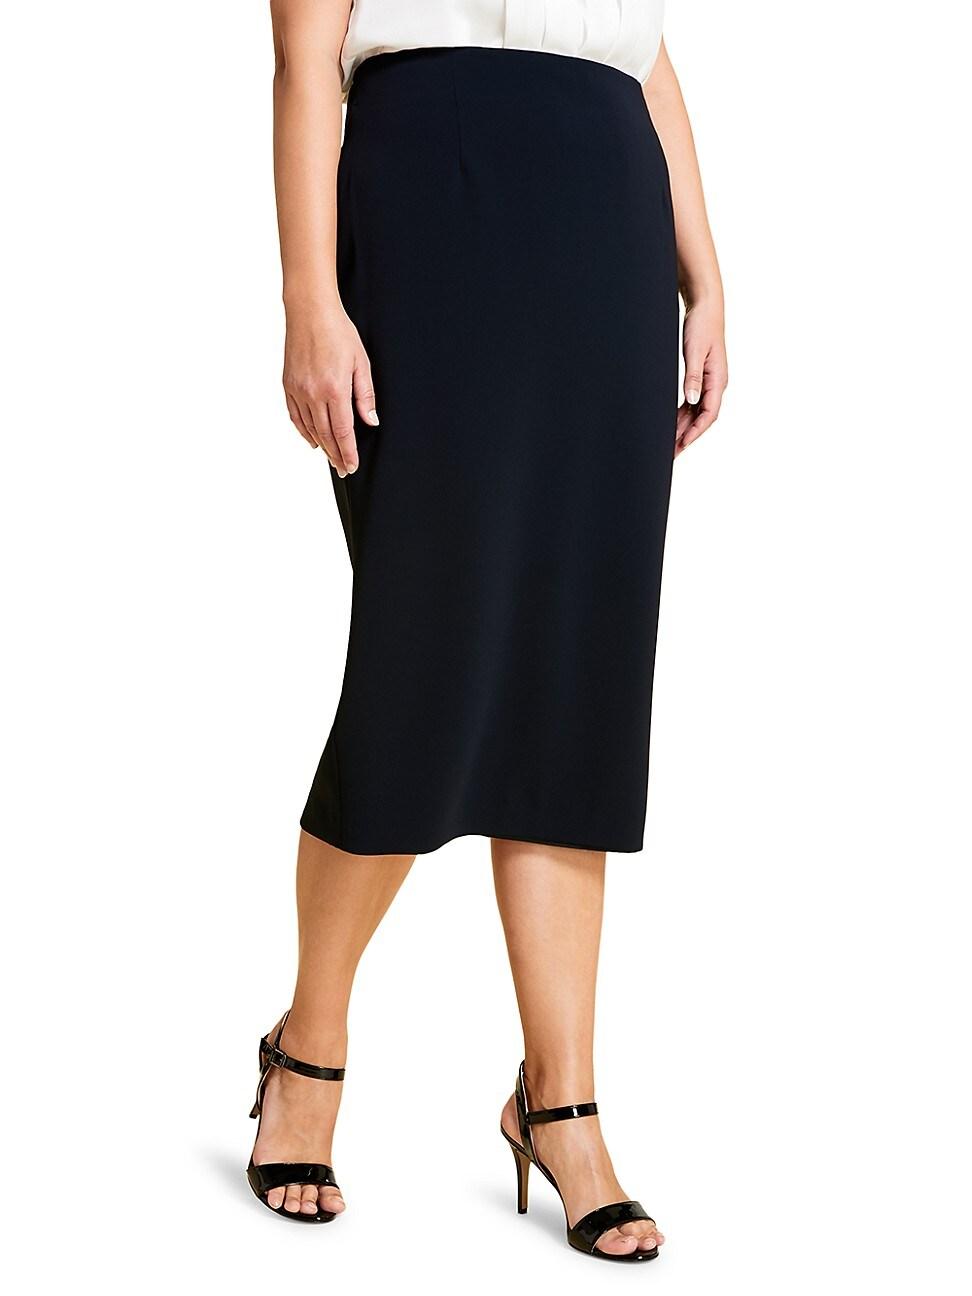 Marina Rinaldi Skirts WOMEN'S PENCIL SKIRT